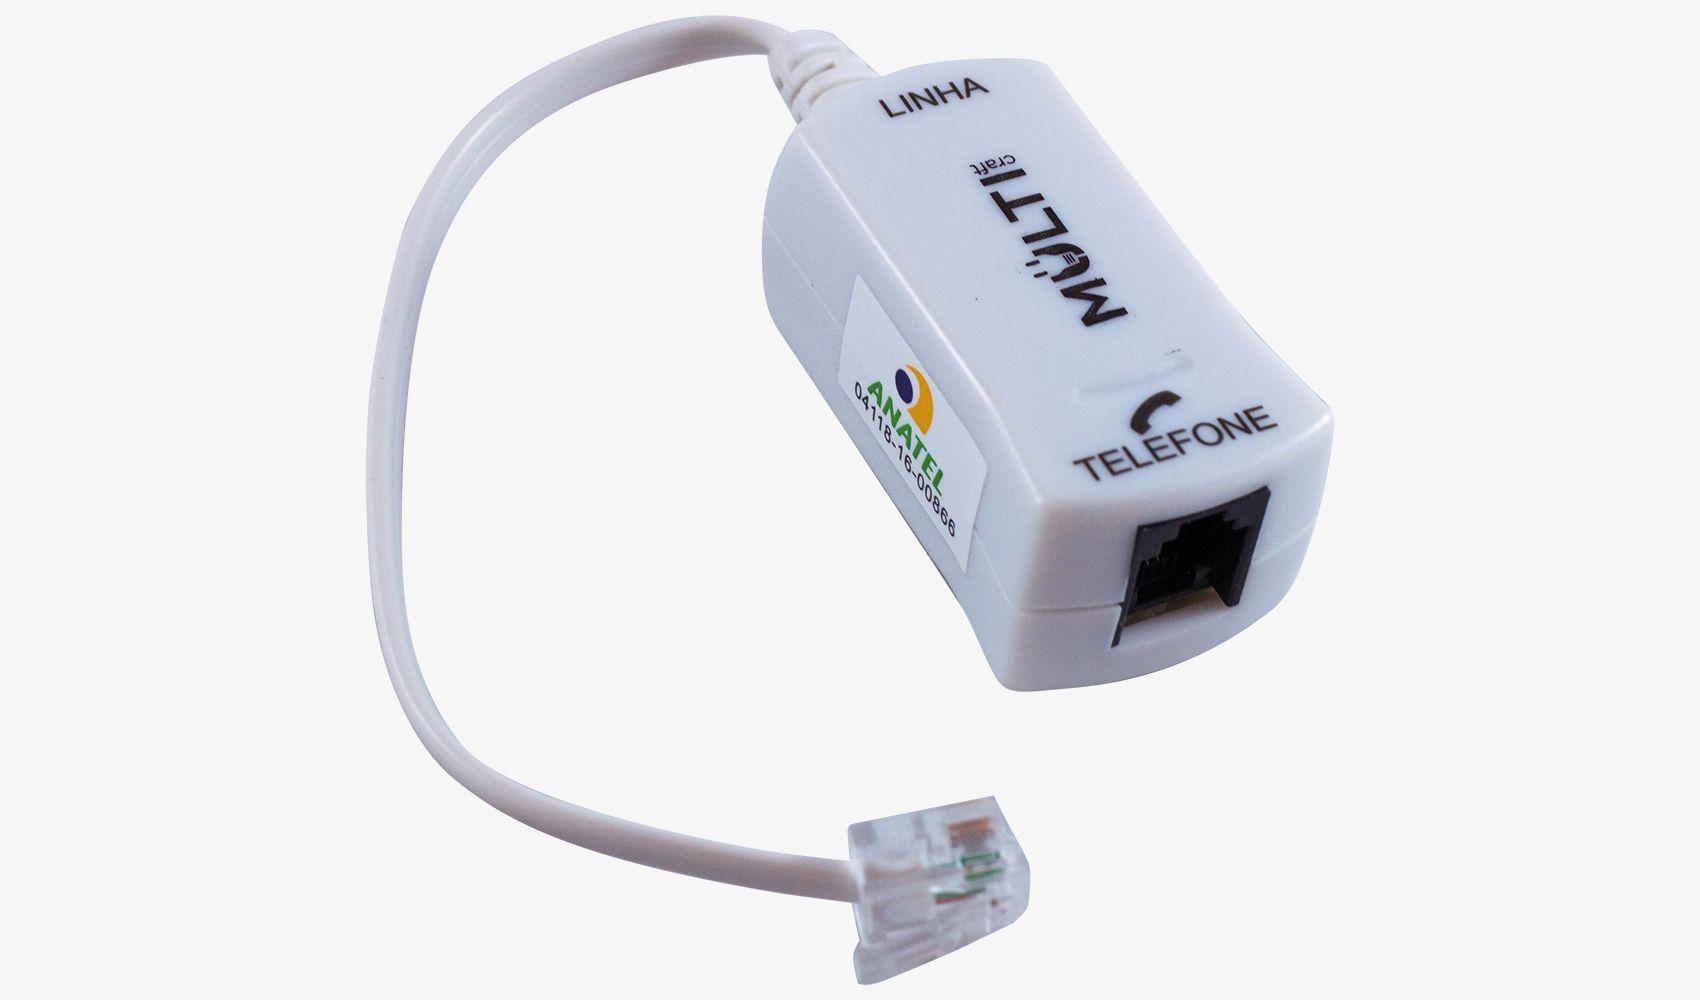 Micro Filtro Adsl Simples Multicraft Branco Internet Modem